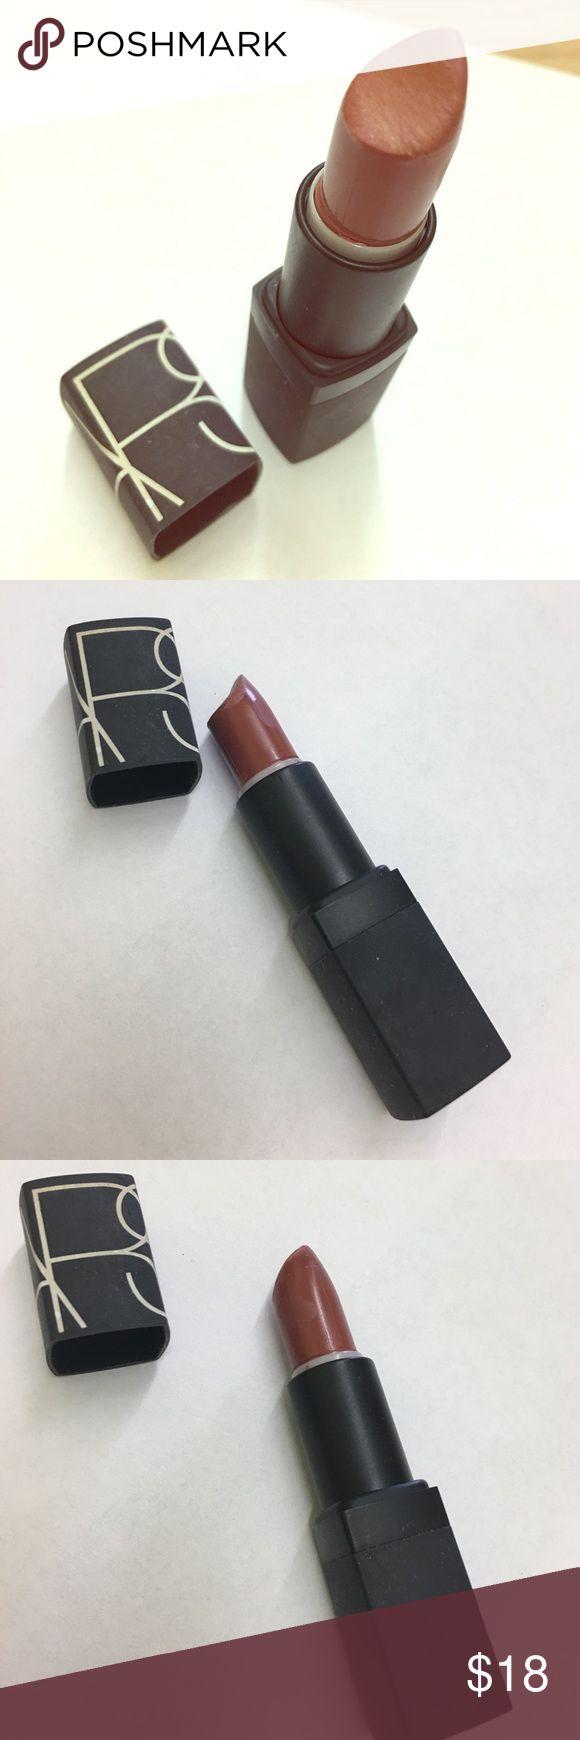 Nars pigalle lipstick Nars pigalle lipstick 💄 8GJD NARS Makeup Lip Balm & Gloss